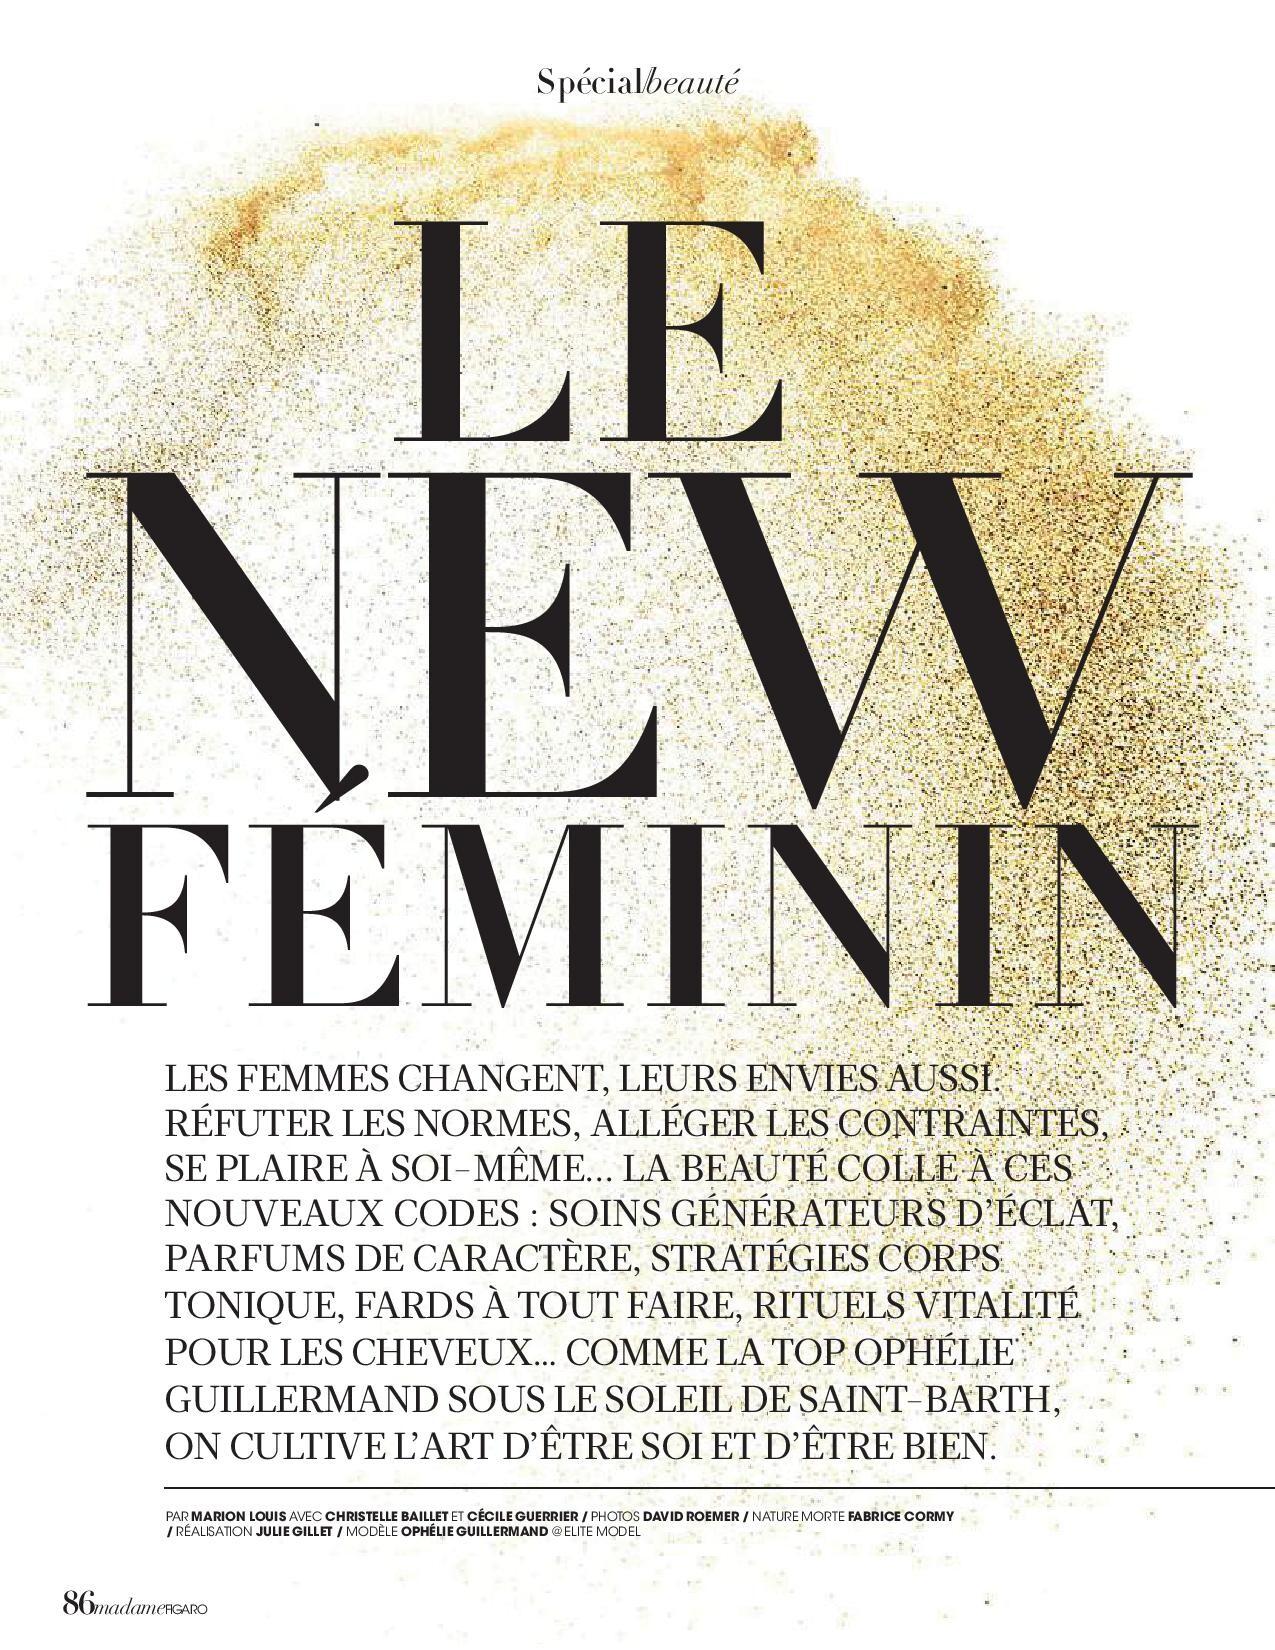 David-Roemer-Madame-Figaro-Apr-5-Ophelie-Guillermand- (16).jpg